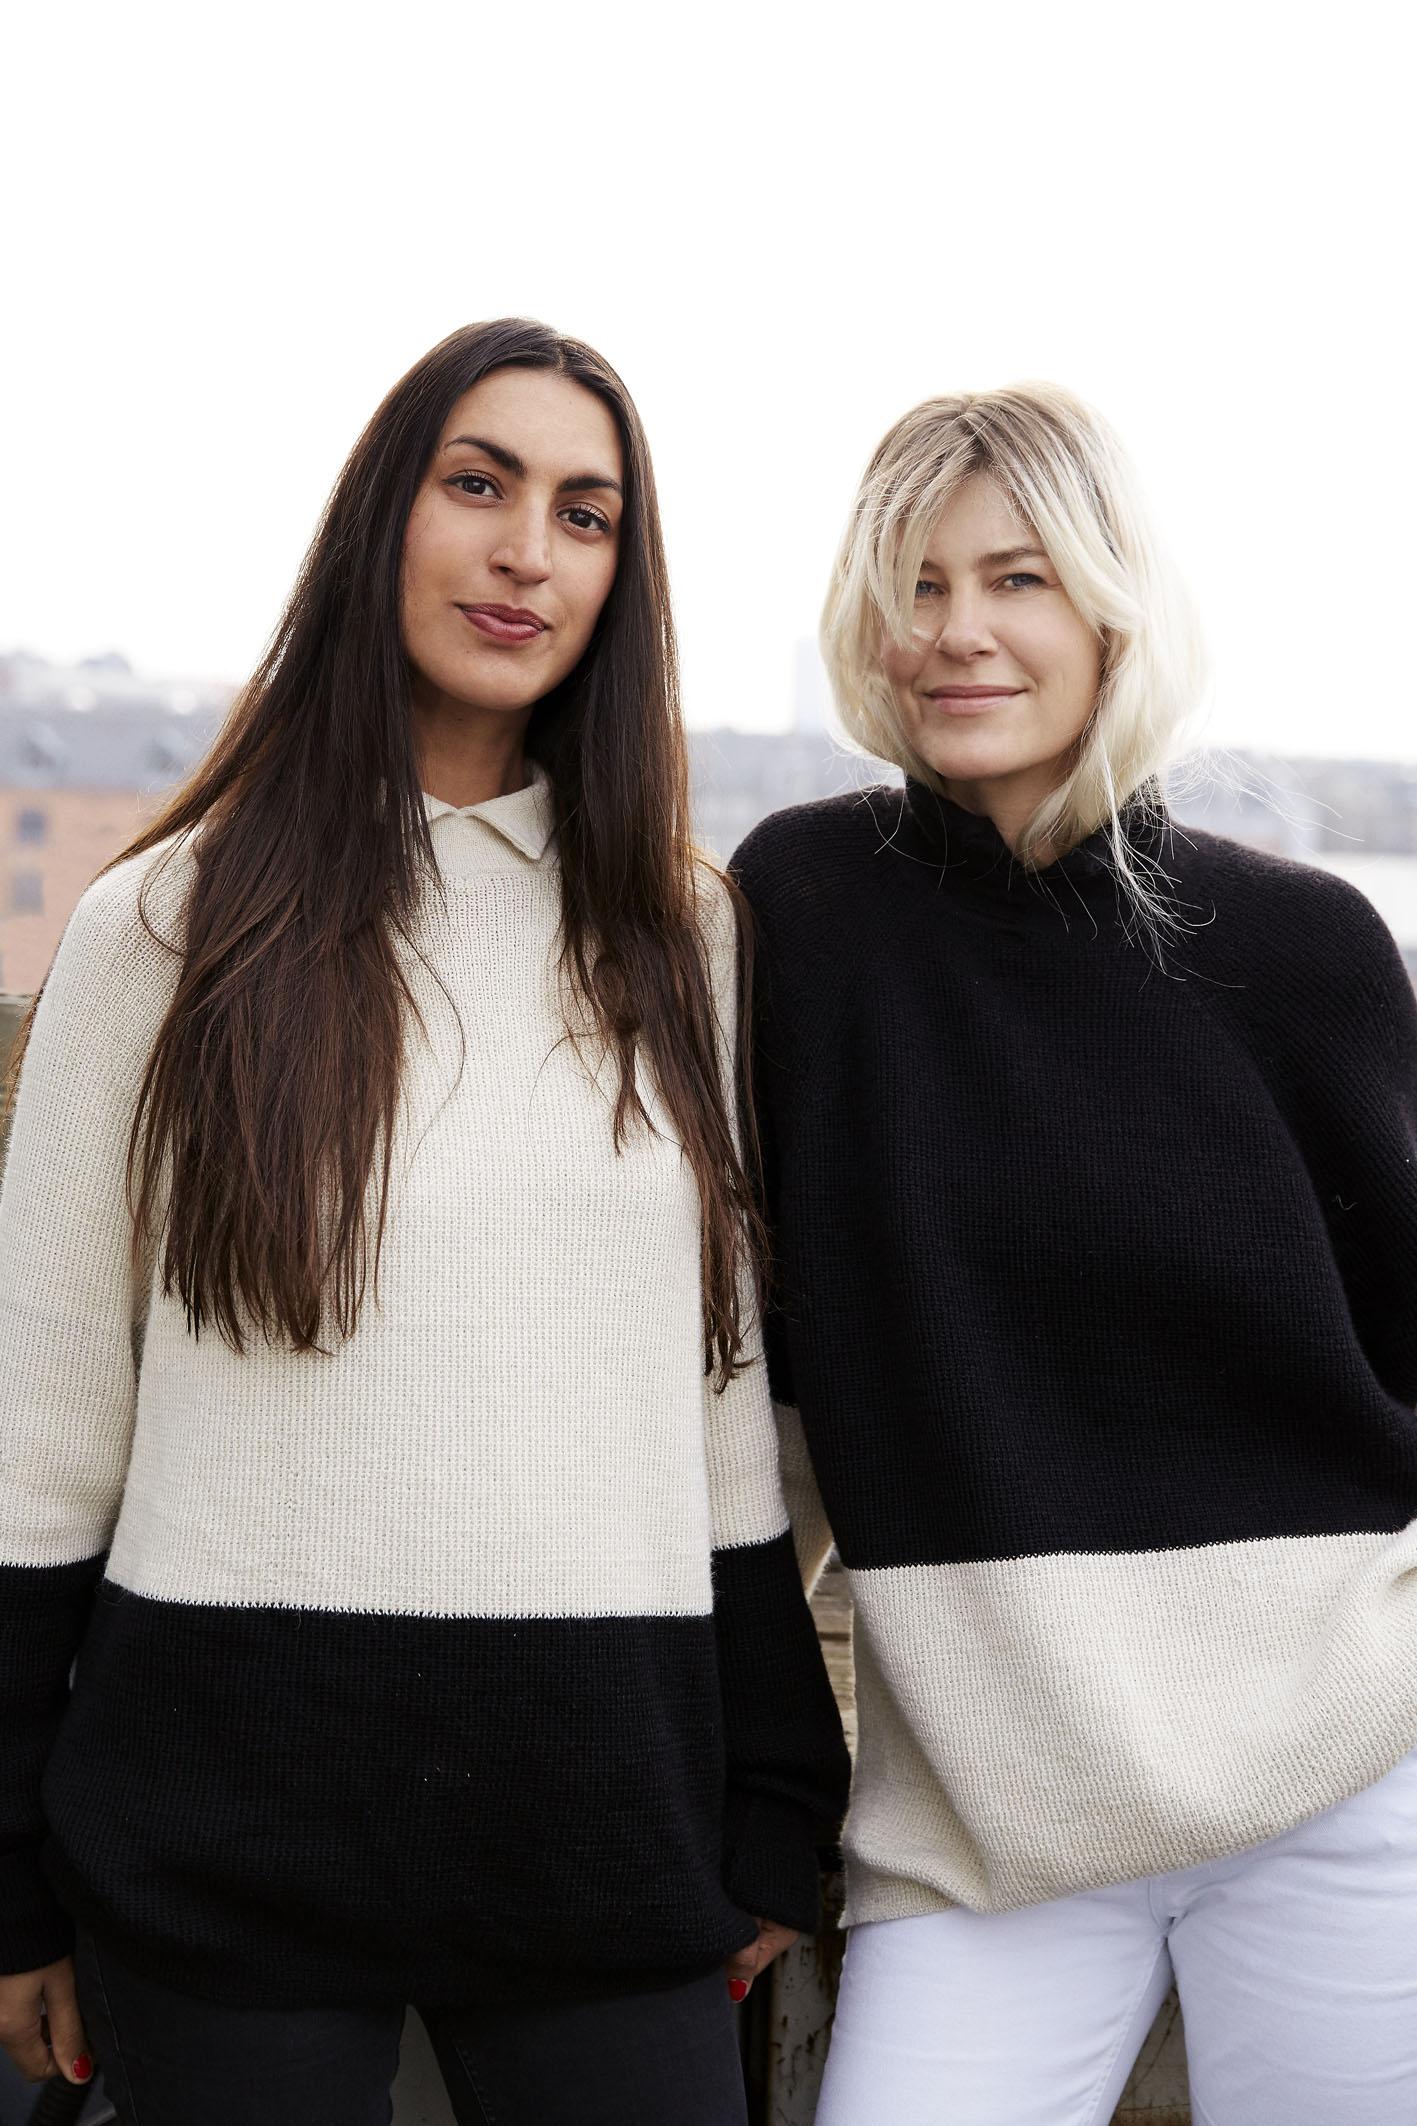 The founders og Carcel Louise van Hauen and .Veronica d'Souza